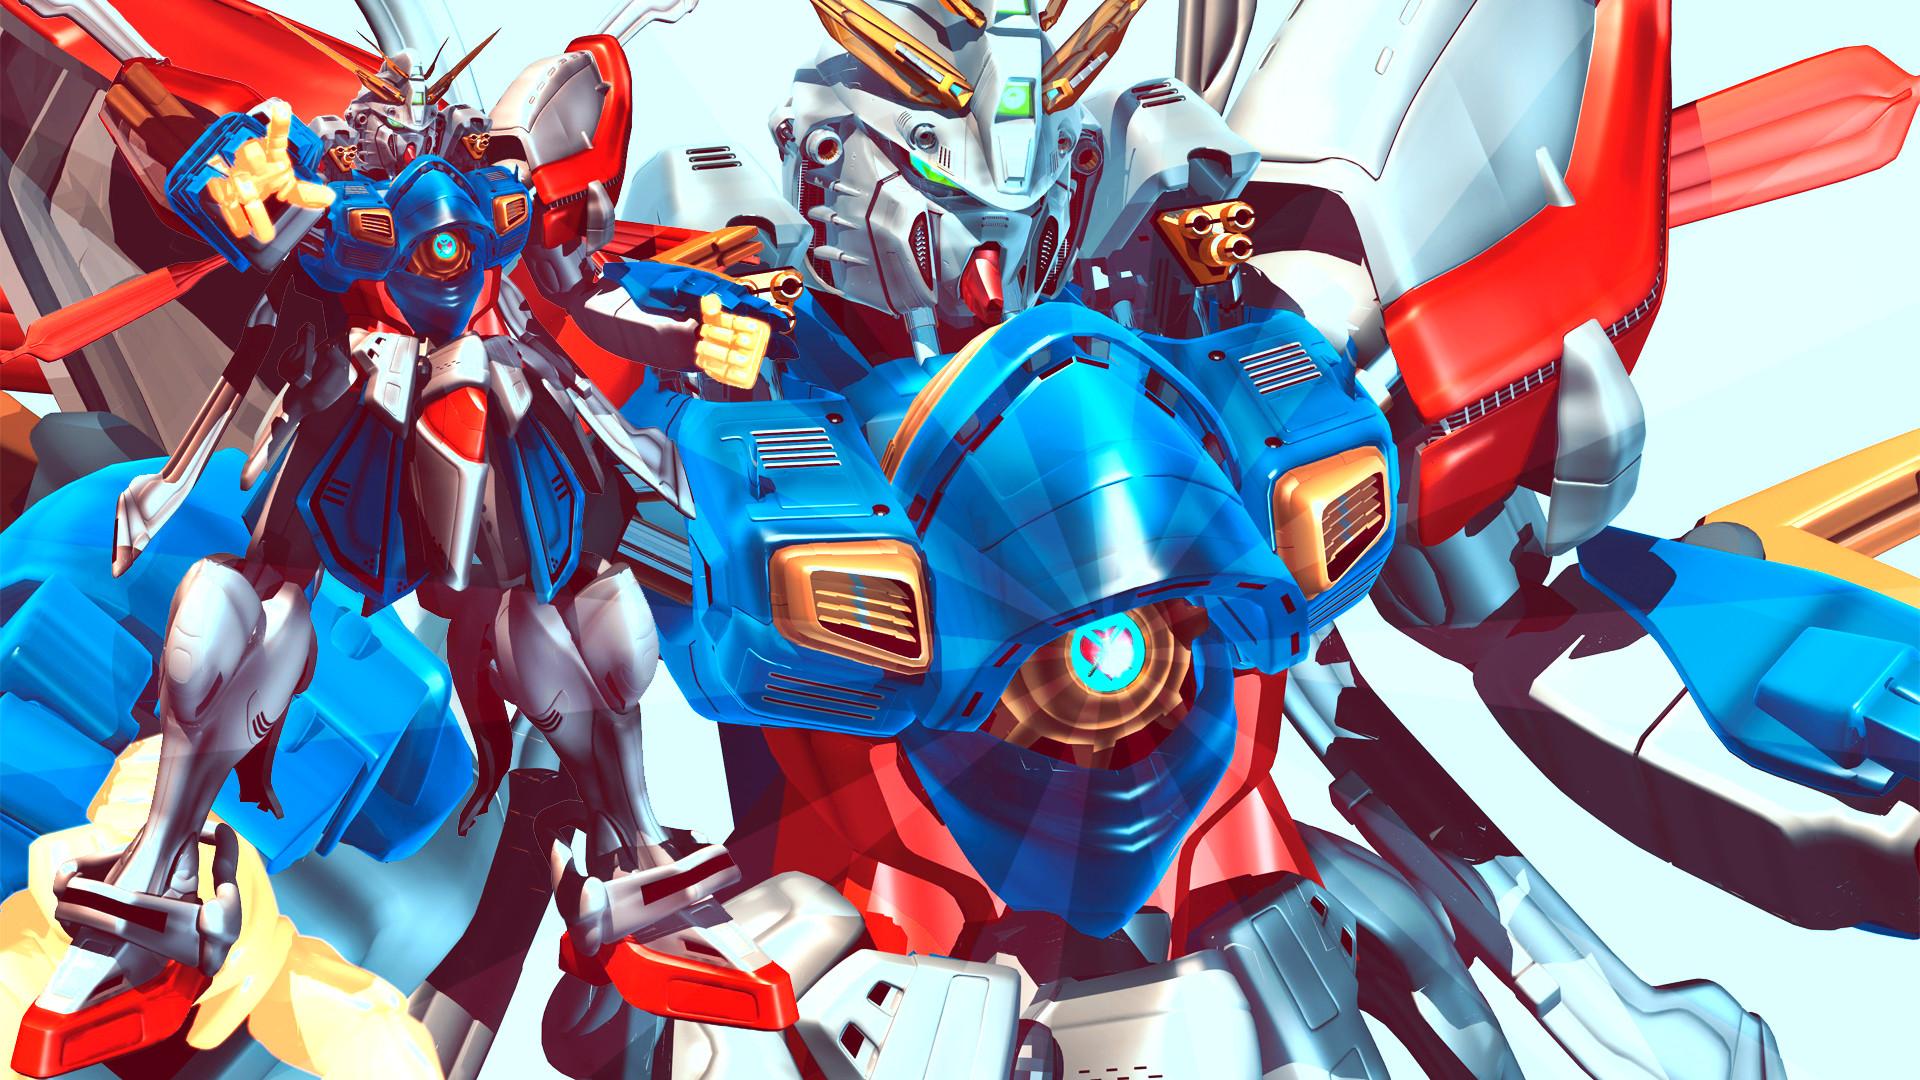 Gundam Wallpaper Gundam